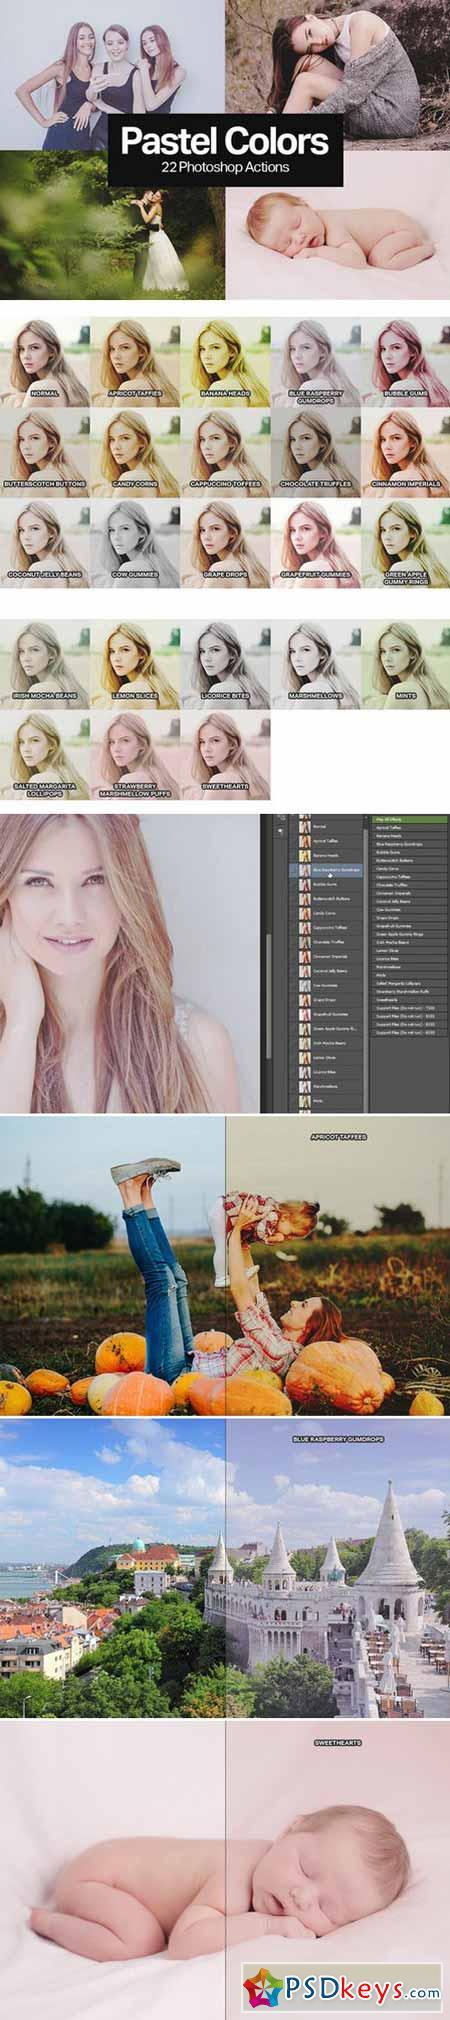 22 Soft Pastel Photoshop Actions 403156